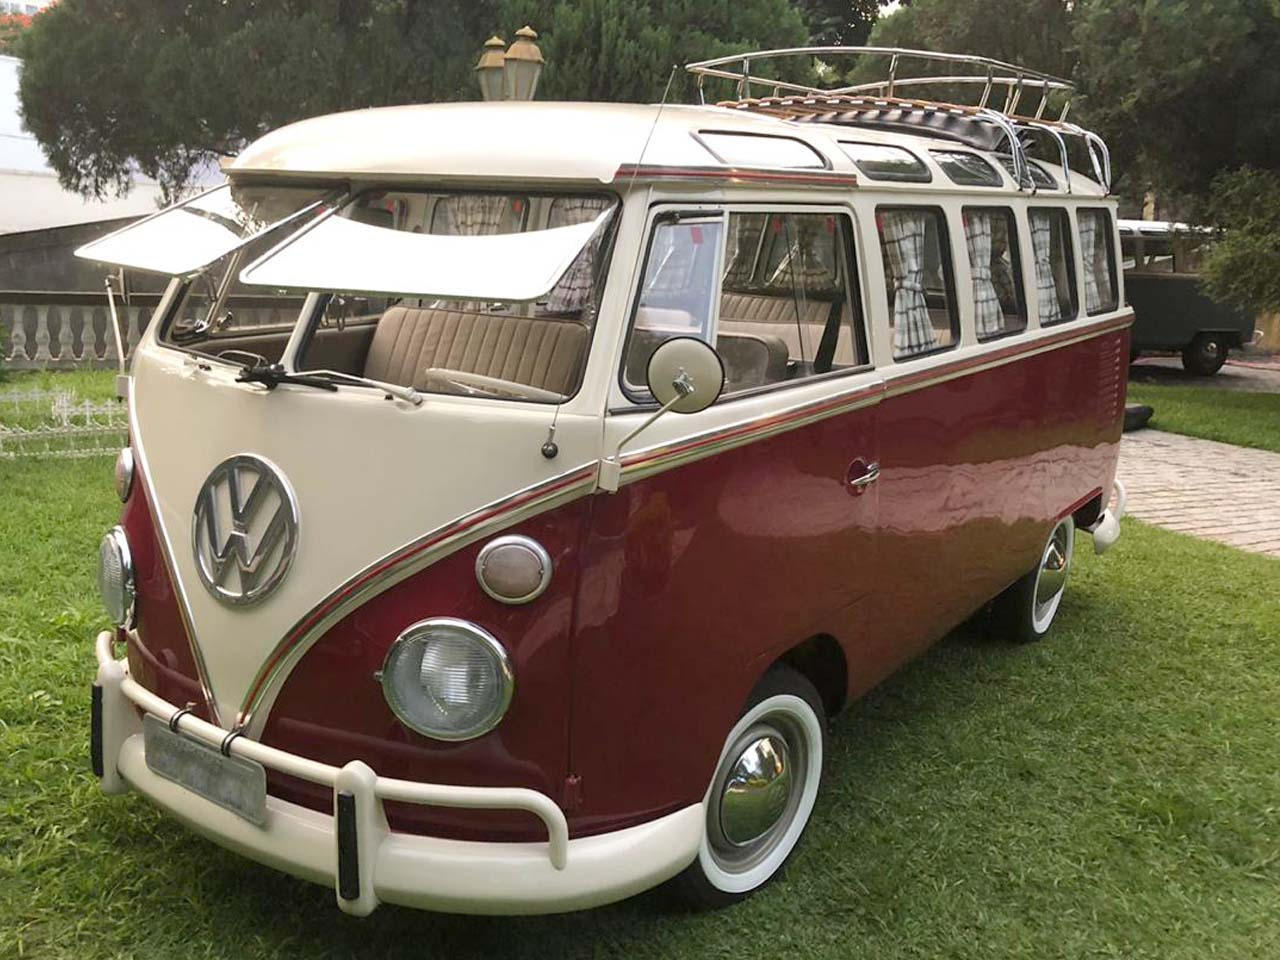 VW Kombi Samba Vermelho Cereja e Branca 1975